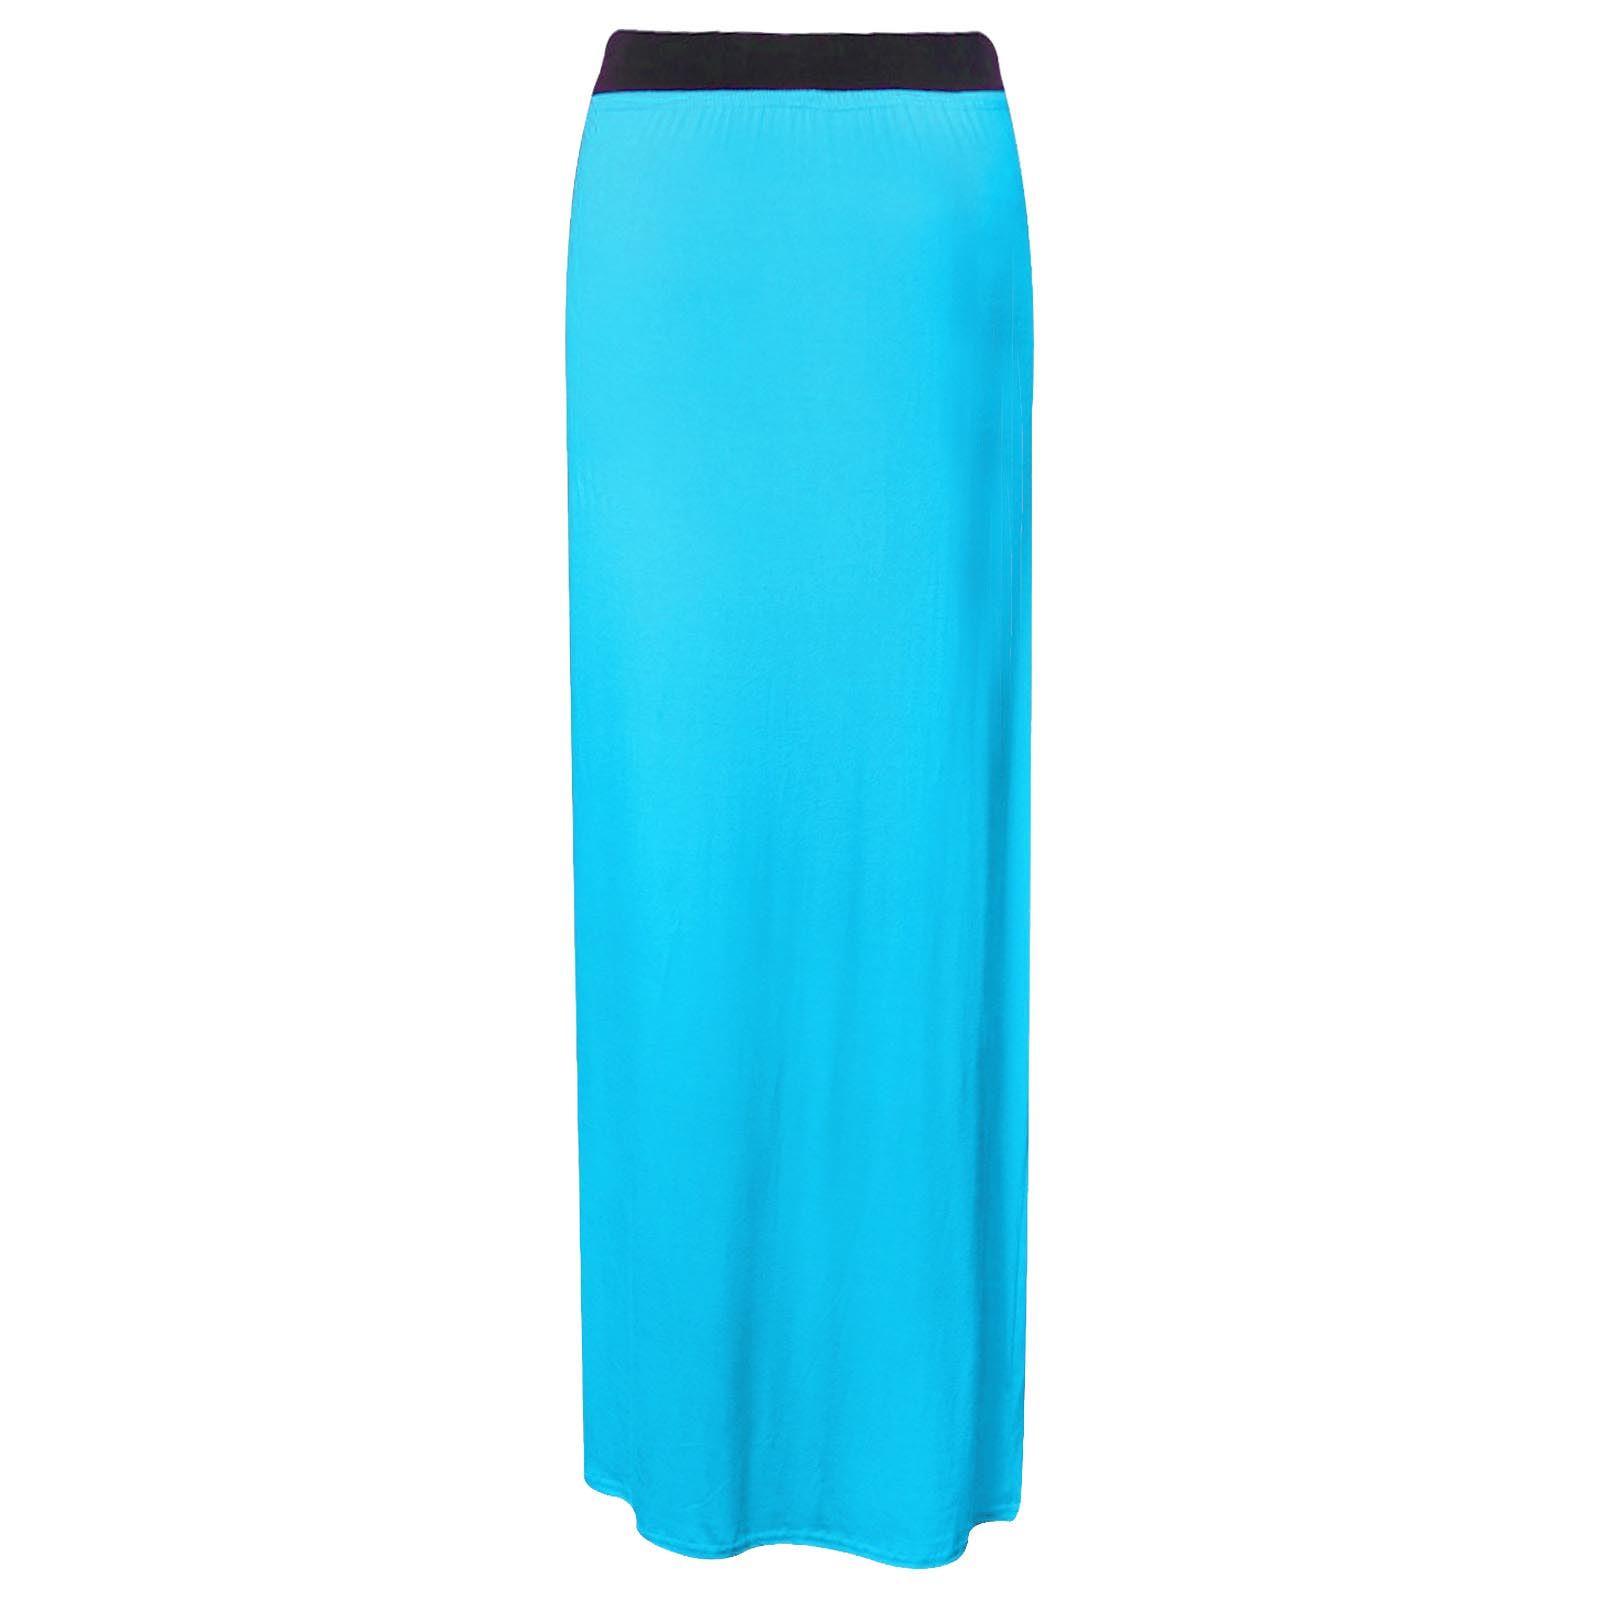 LADIES-WOMENS-LONG-GYPSY-ELASTIC-JERSEY-BODYCON-SUMMER-MAXI-PRINTED-SKIRT-DRESS